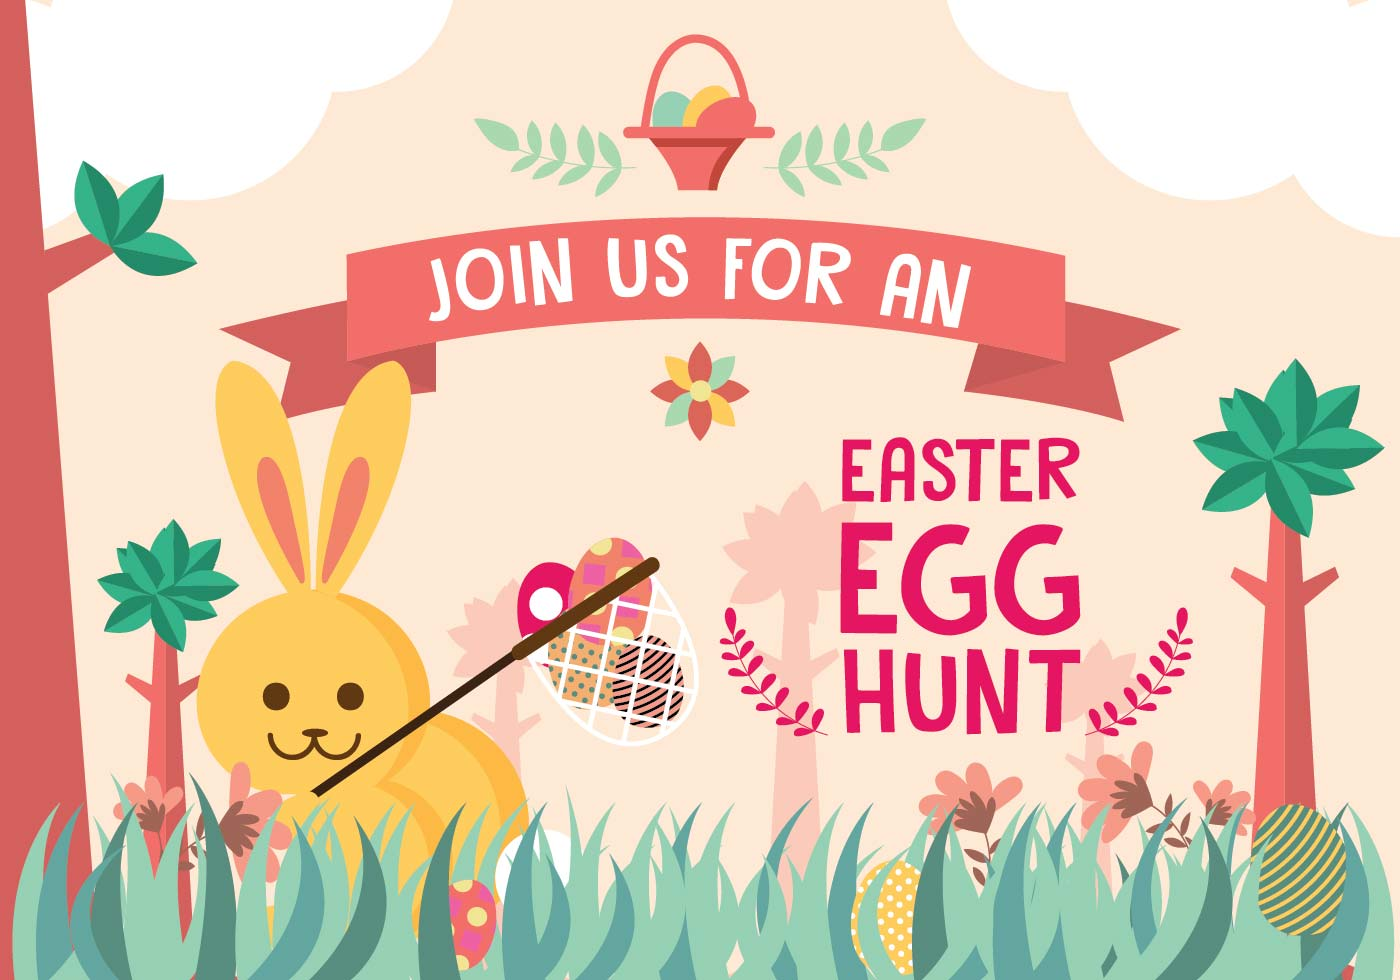 easter egg hunt invitation background vector download easter egg hunt clip art png easter egg hunt clipart free